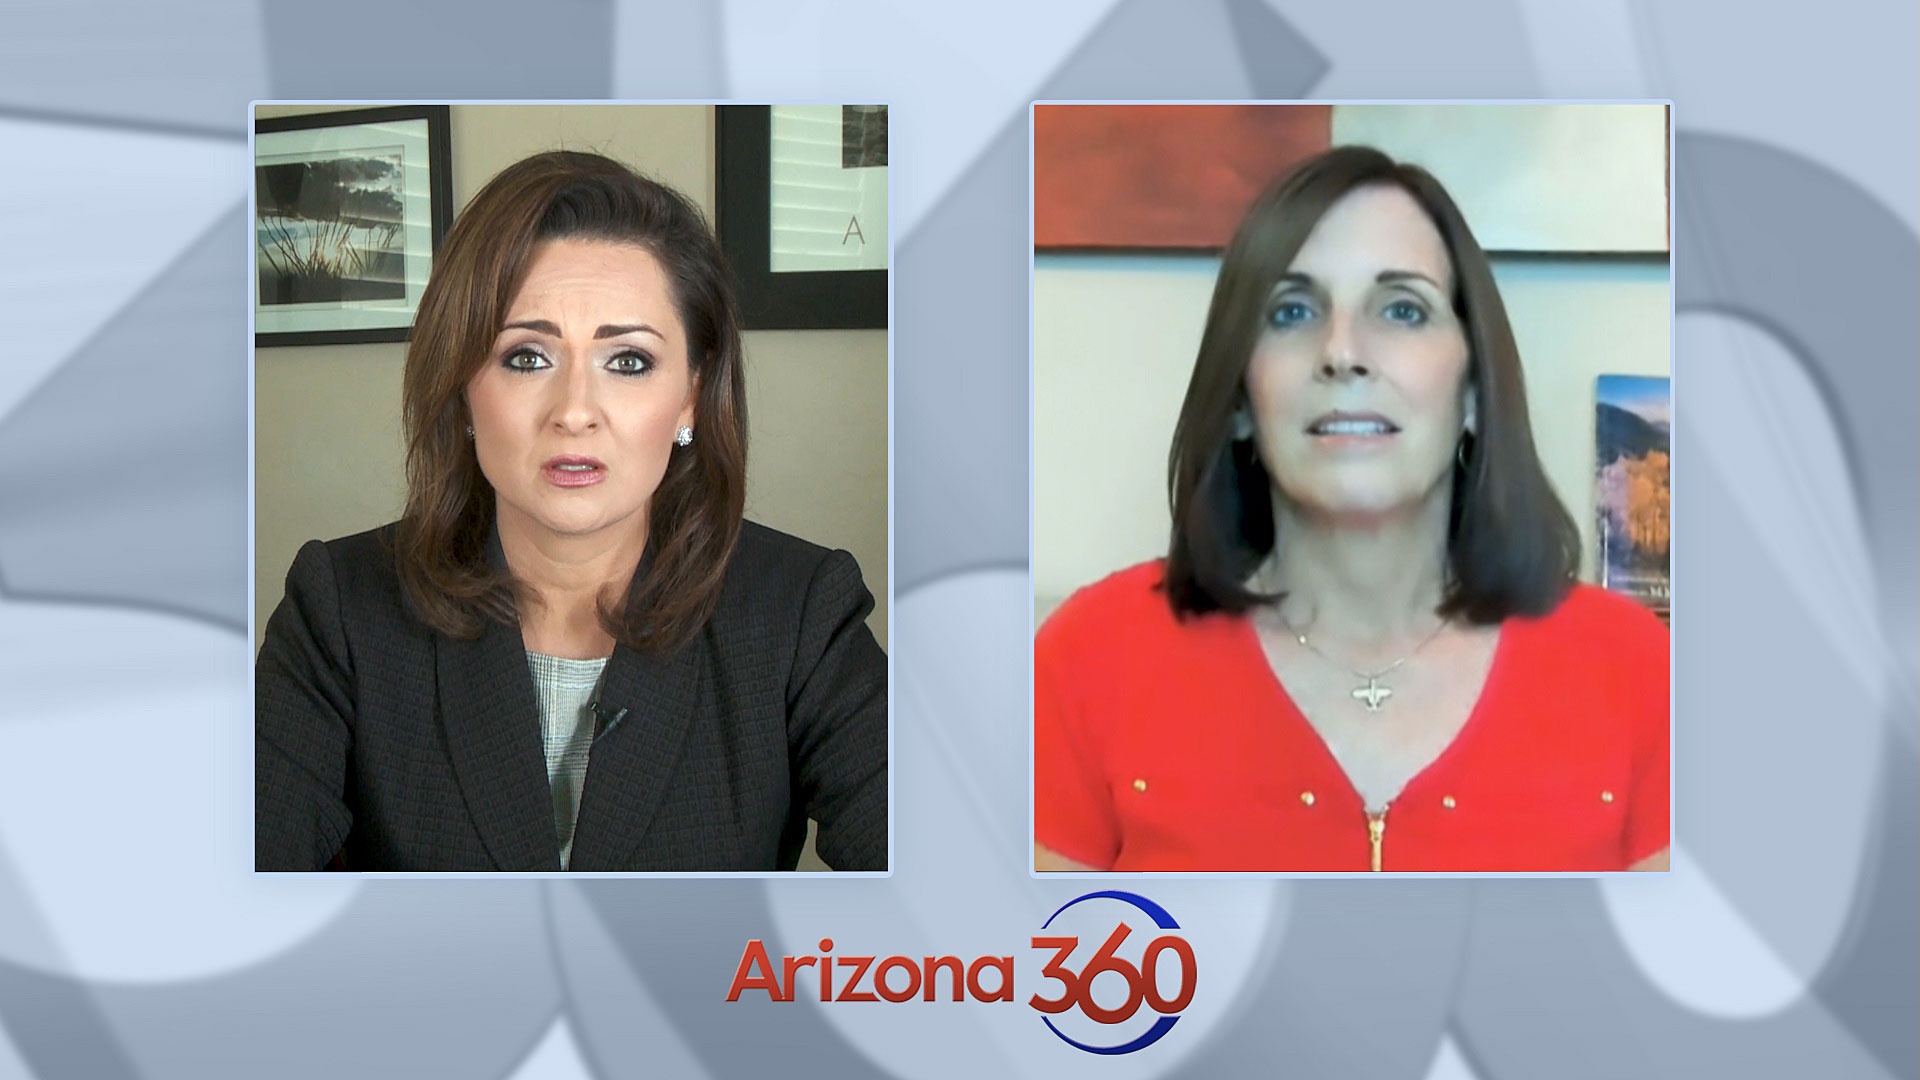 Arizona 360 host Lorraine Rivera interviews Republican Sen. Martha McSally on Sept. 28, 2020.